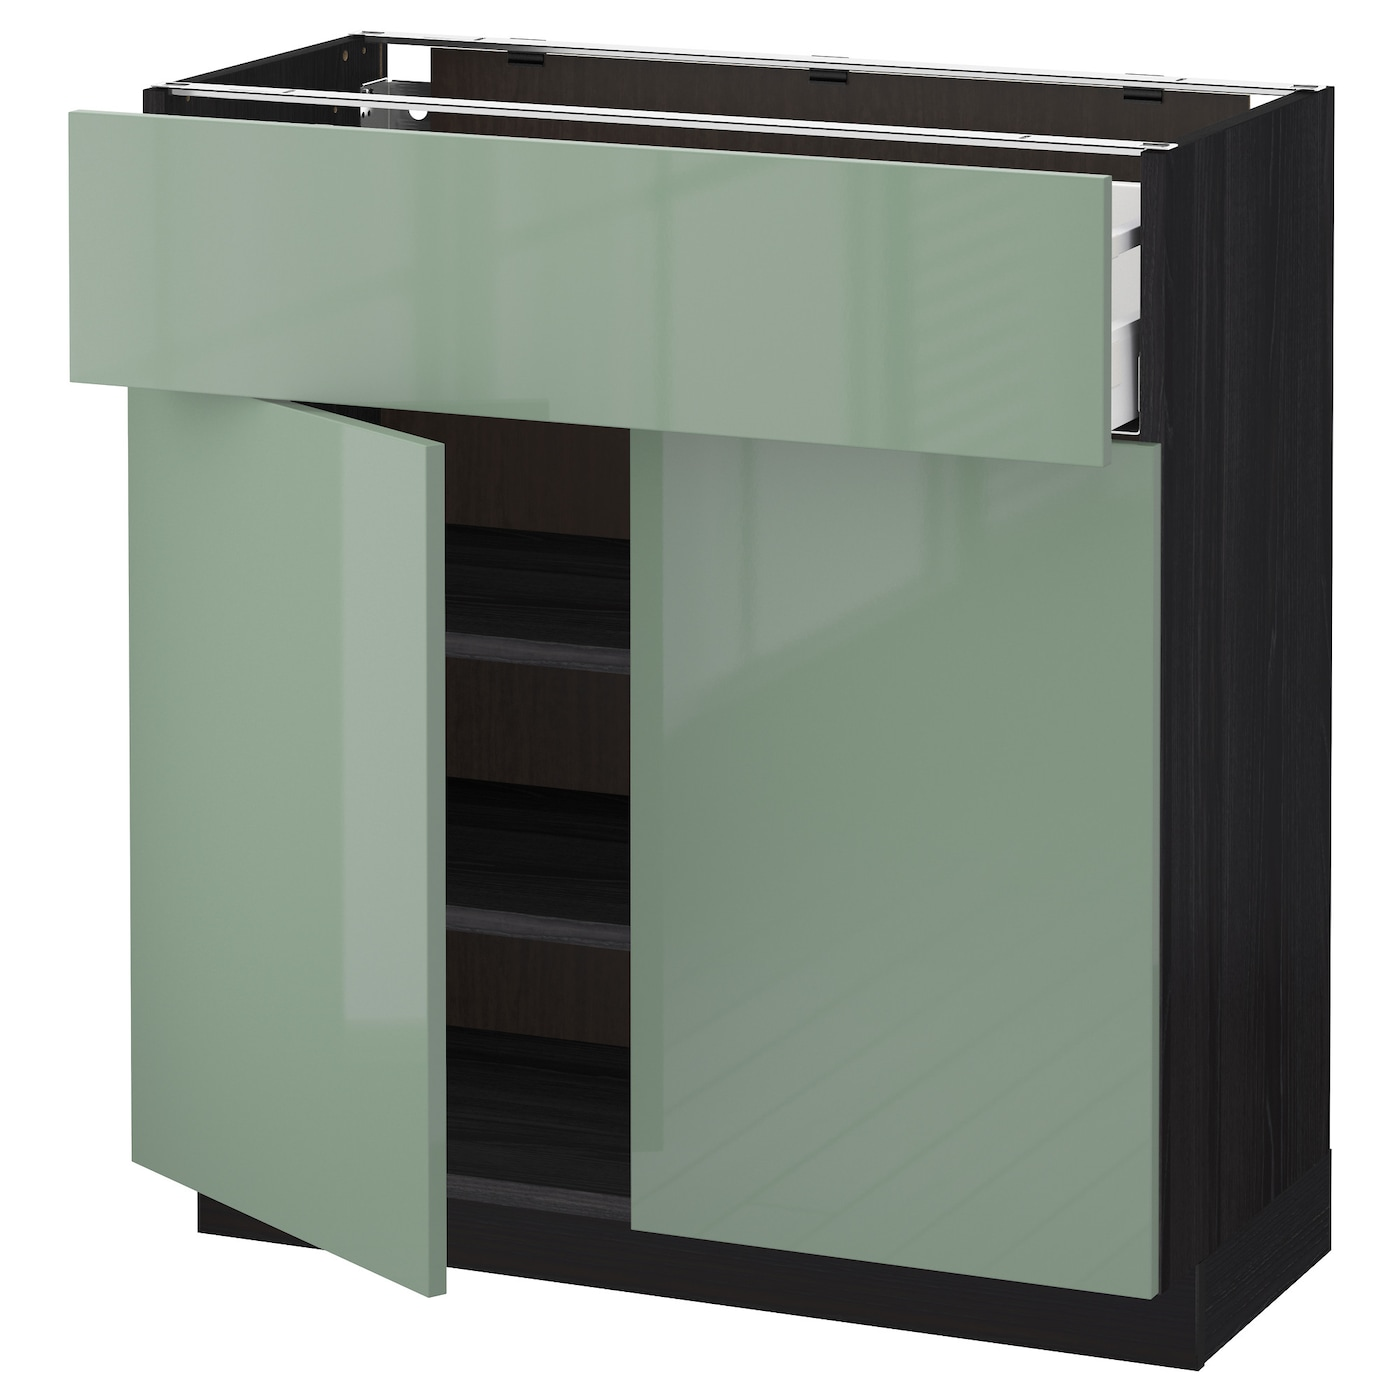 Ikea Kitchen Black Cabinets: METOD/MAXIMERA Base Cabinet With Drawer/2 Doors Black/kallarp Light Green 80x37 Cm